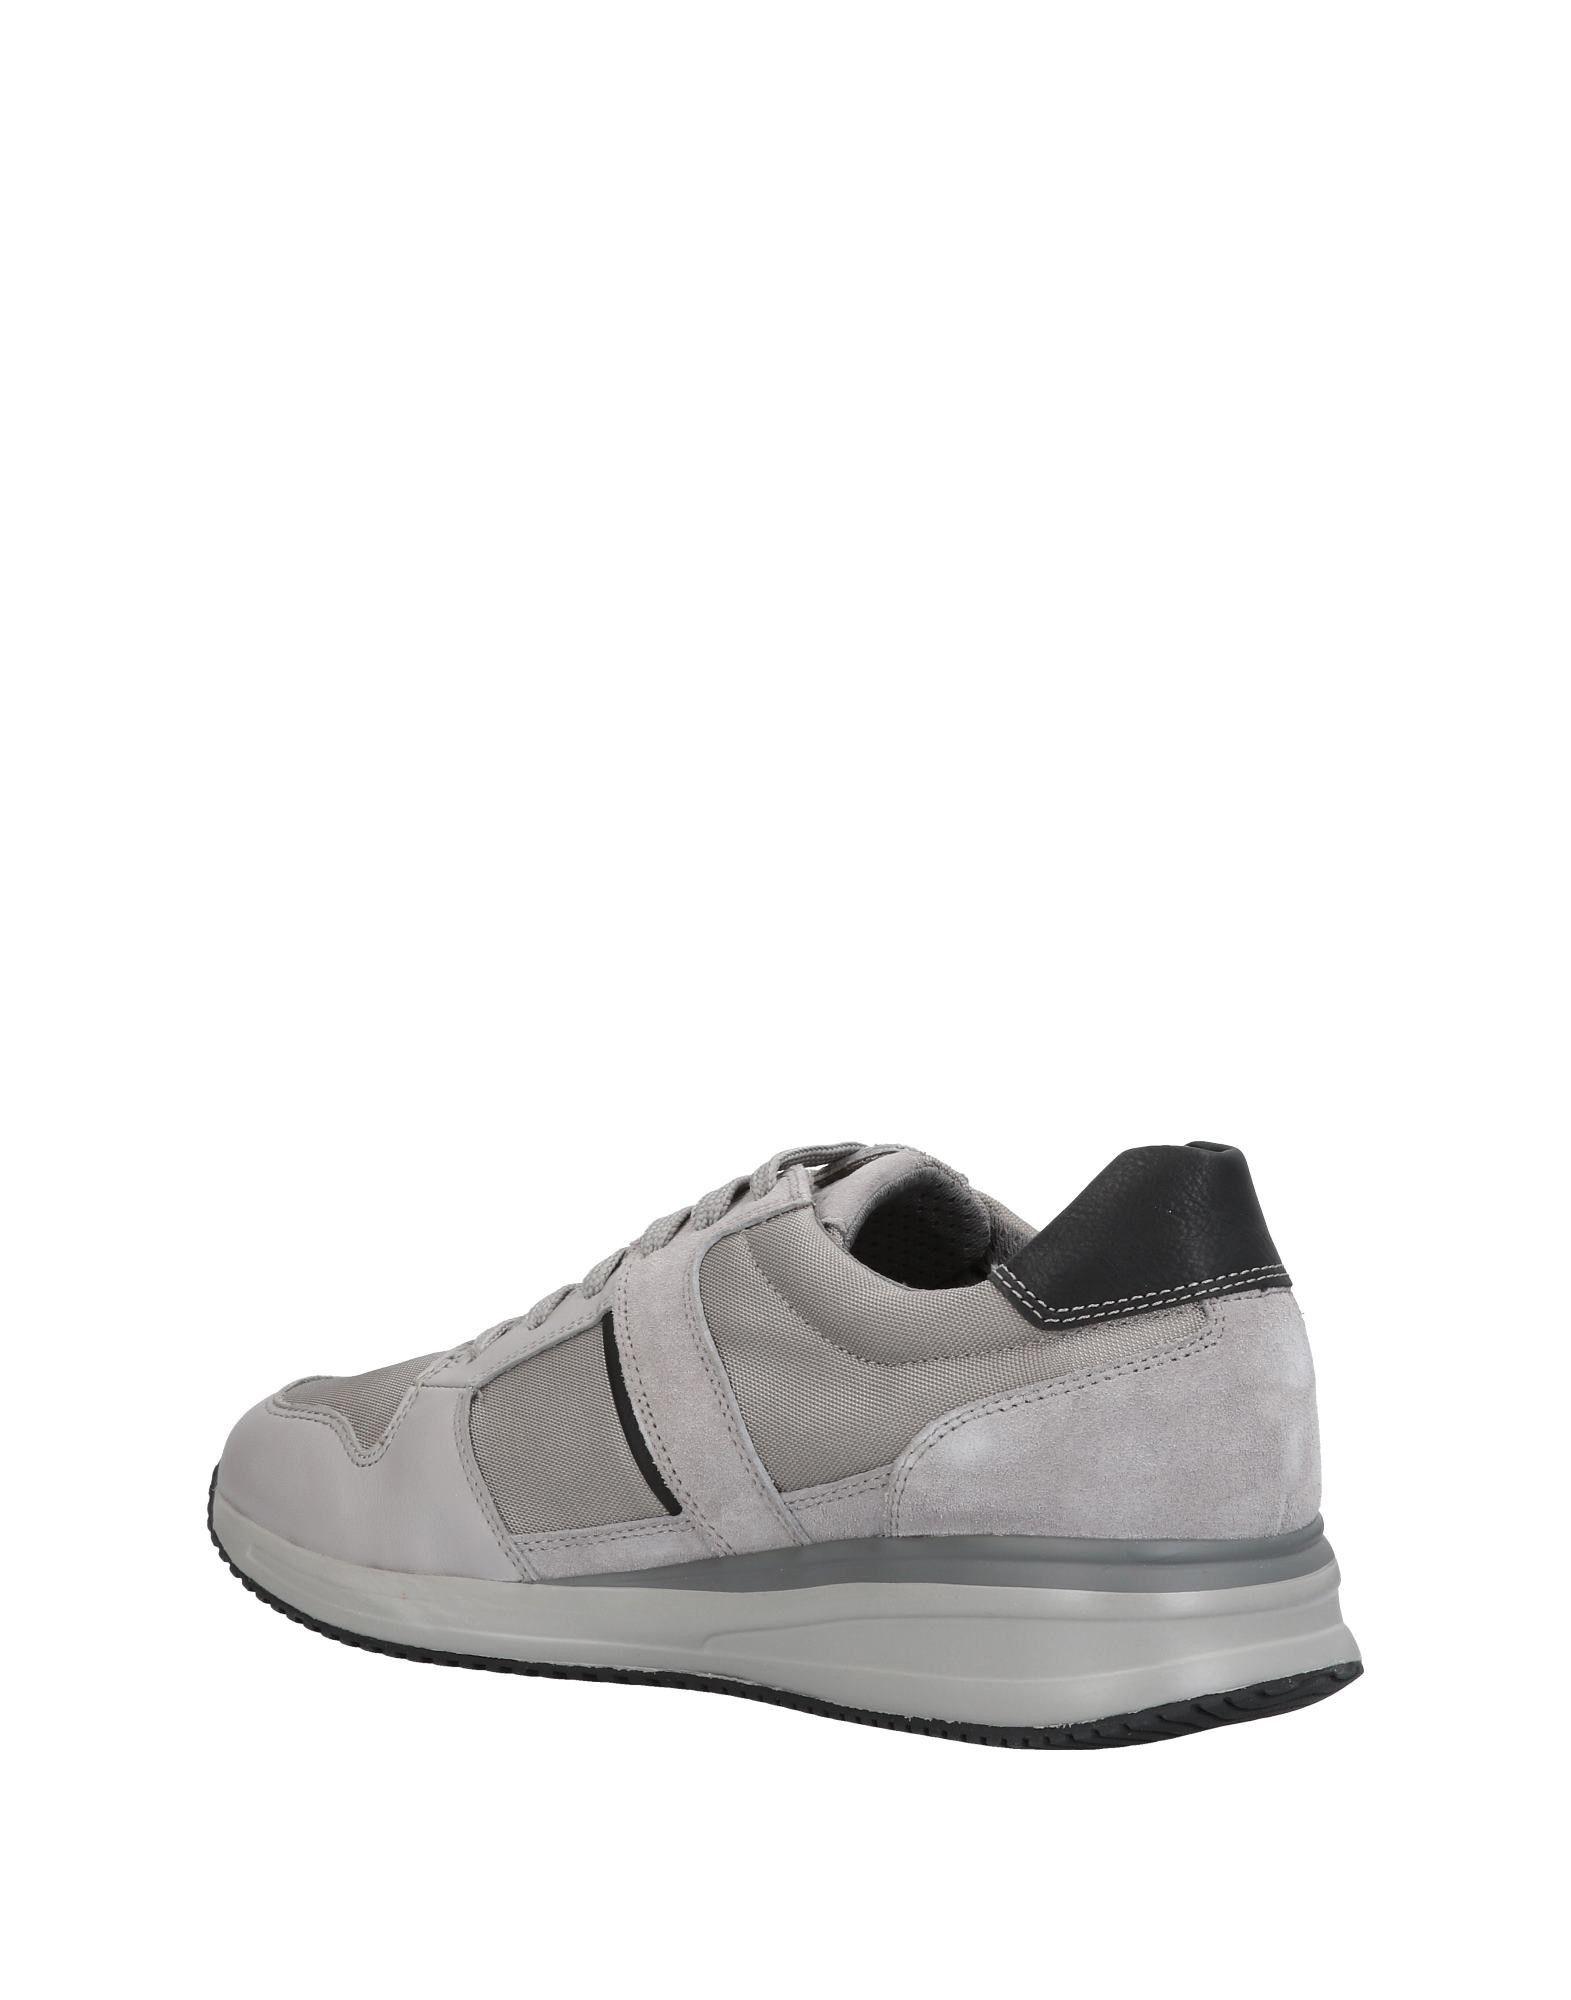 Geox Sneakers Herren  Schuhe 11418342AG Heiße Schuhe  6d9038